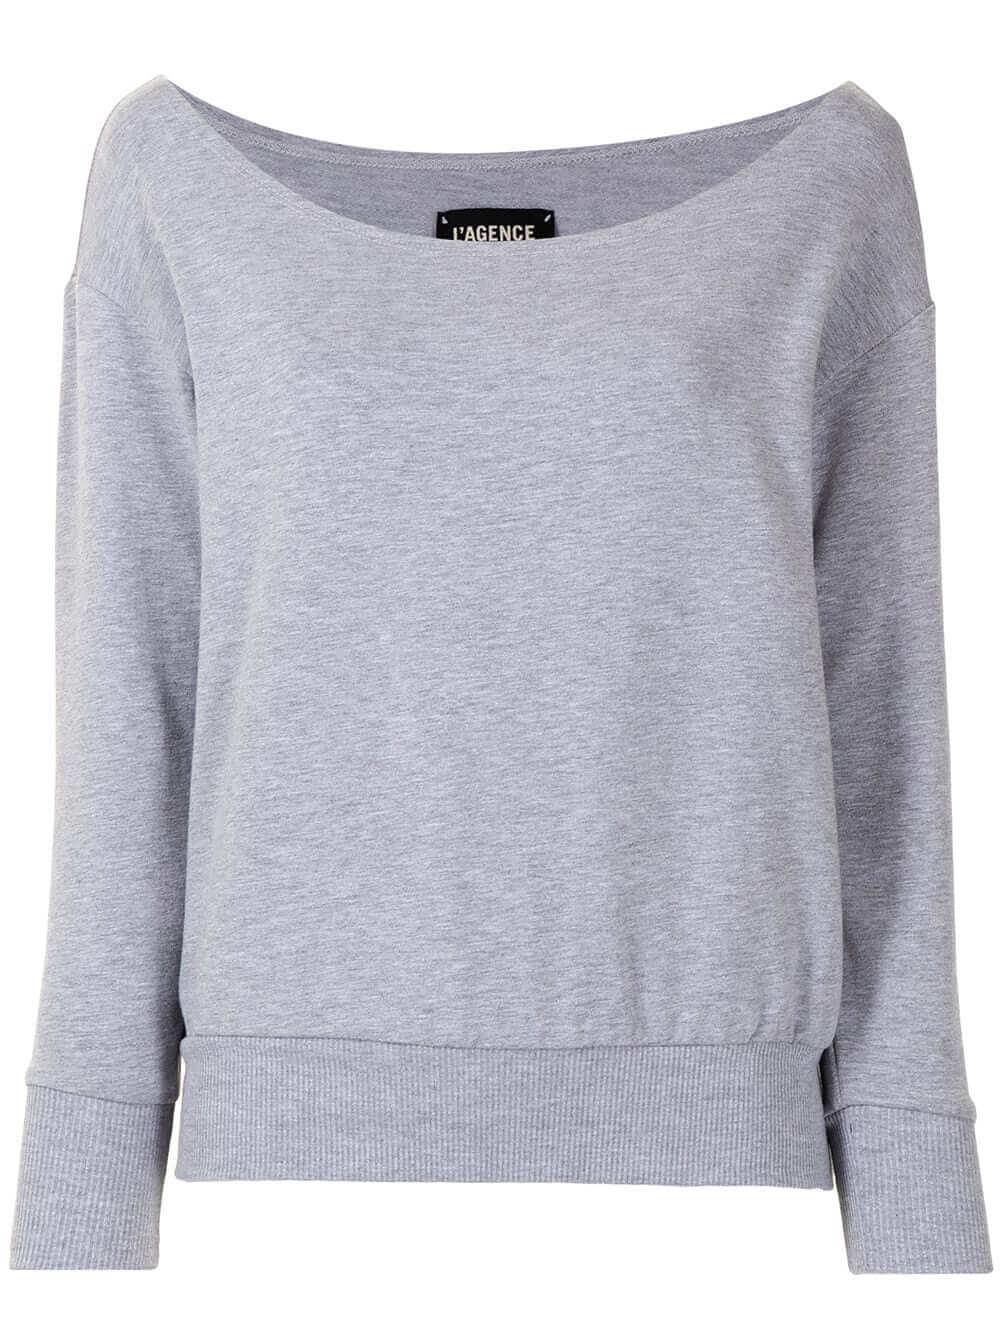 Kimora Sweatshirt Item # 8616HGF